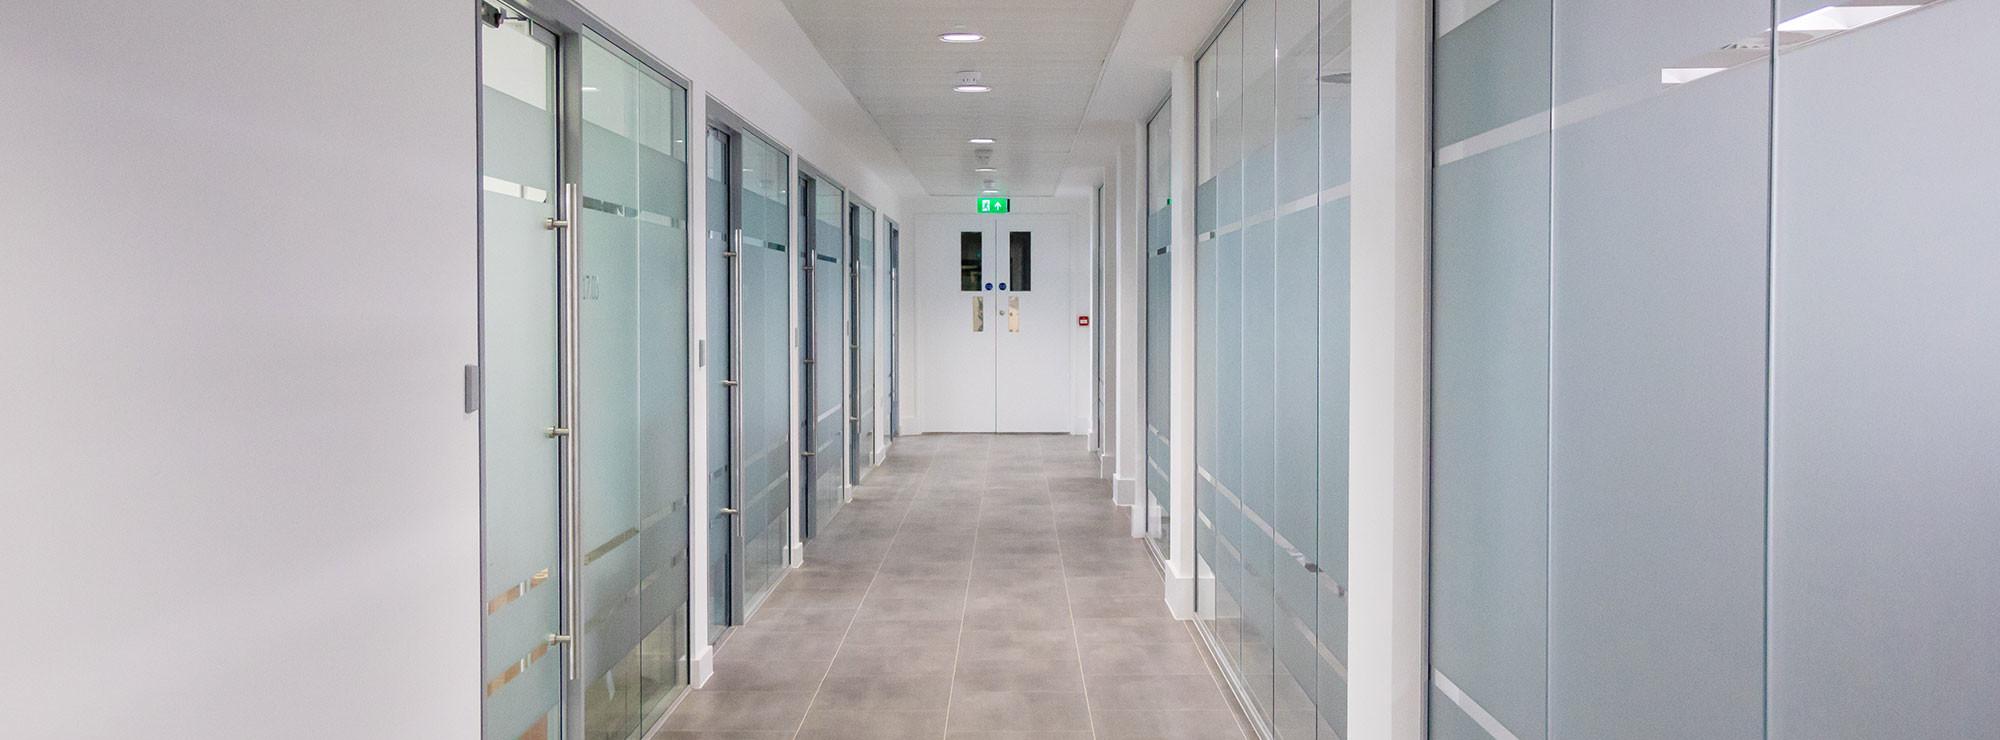 Corridor lighting and cctv